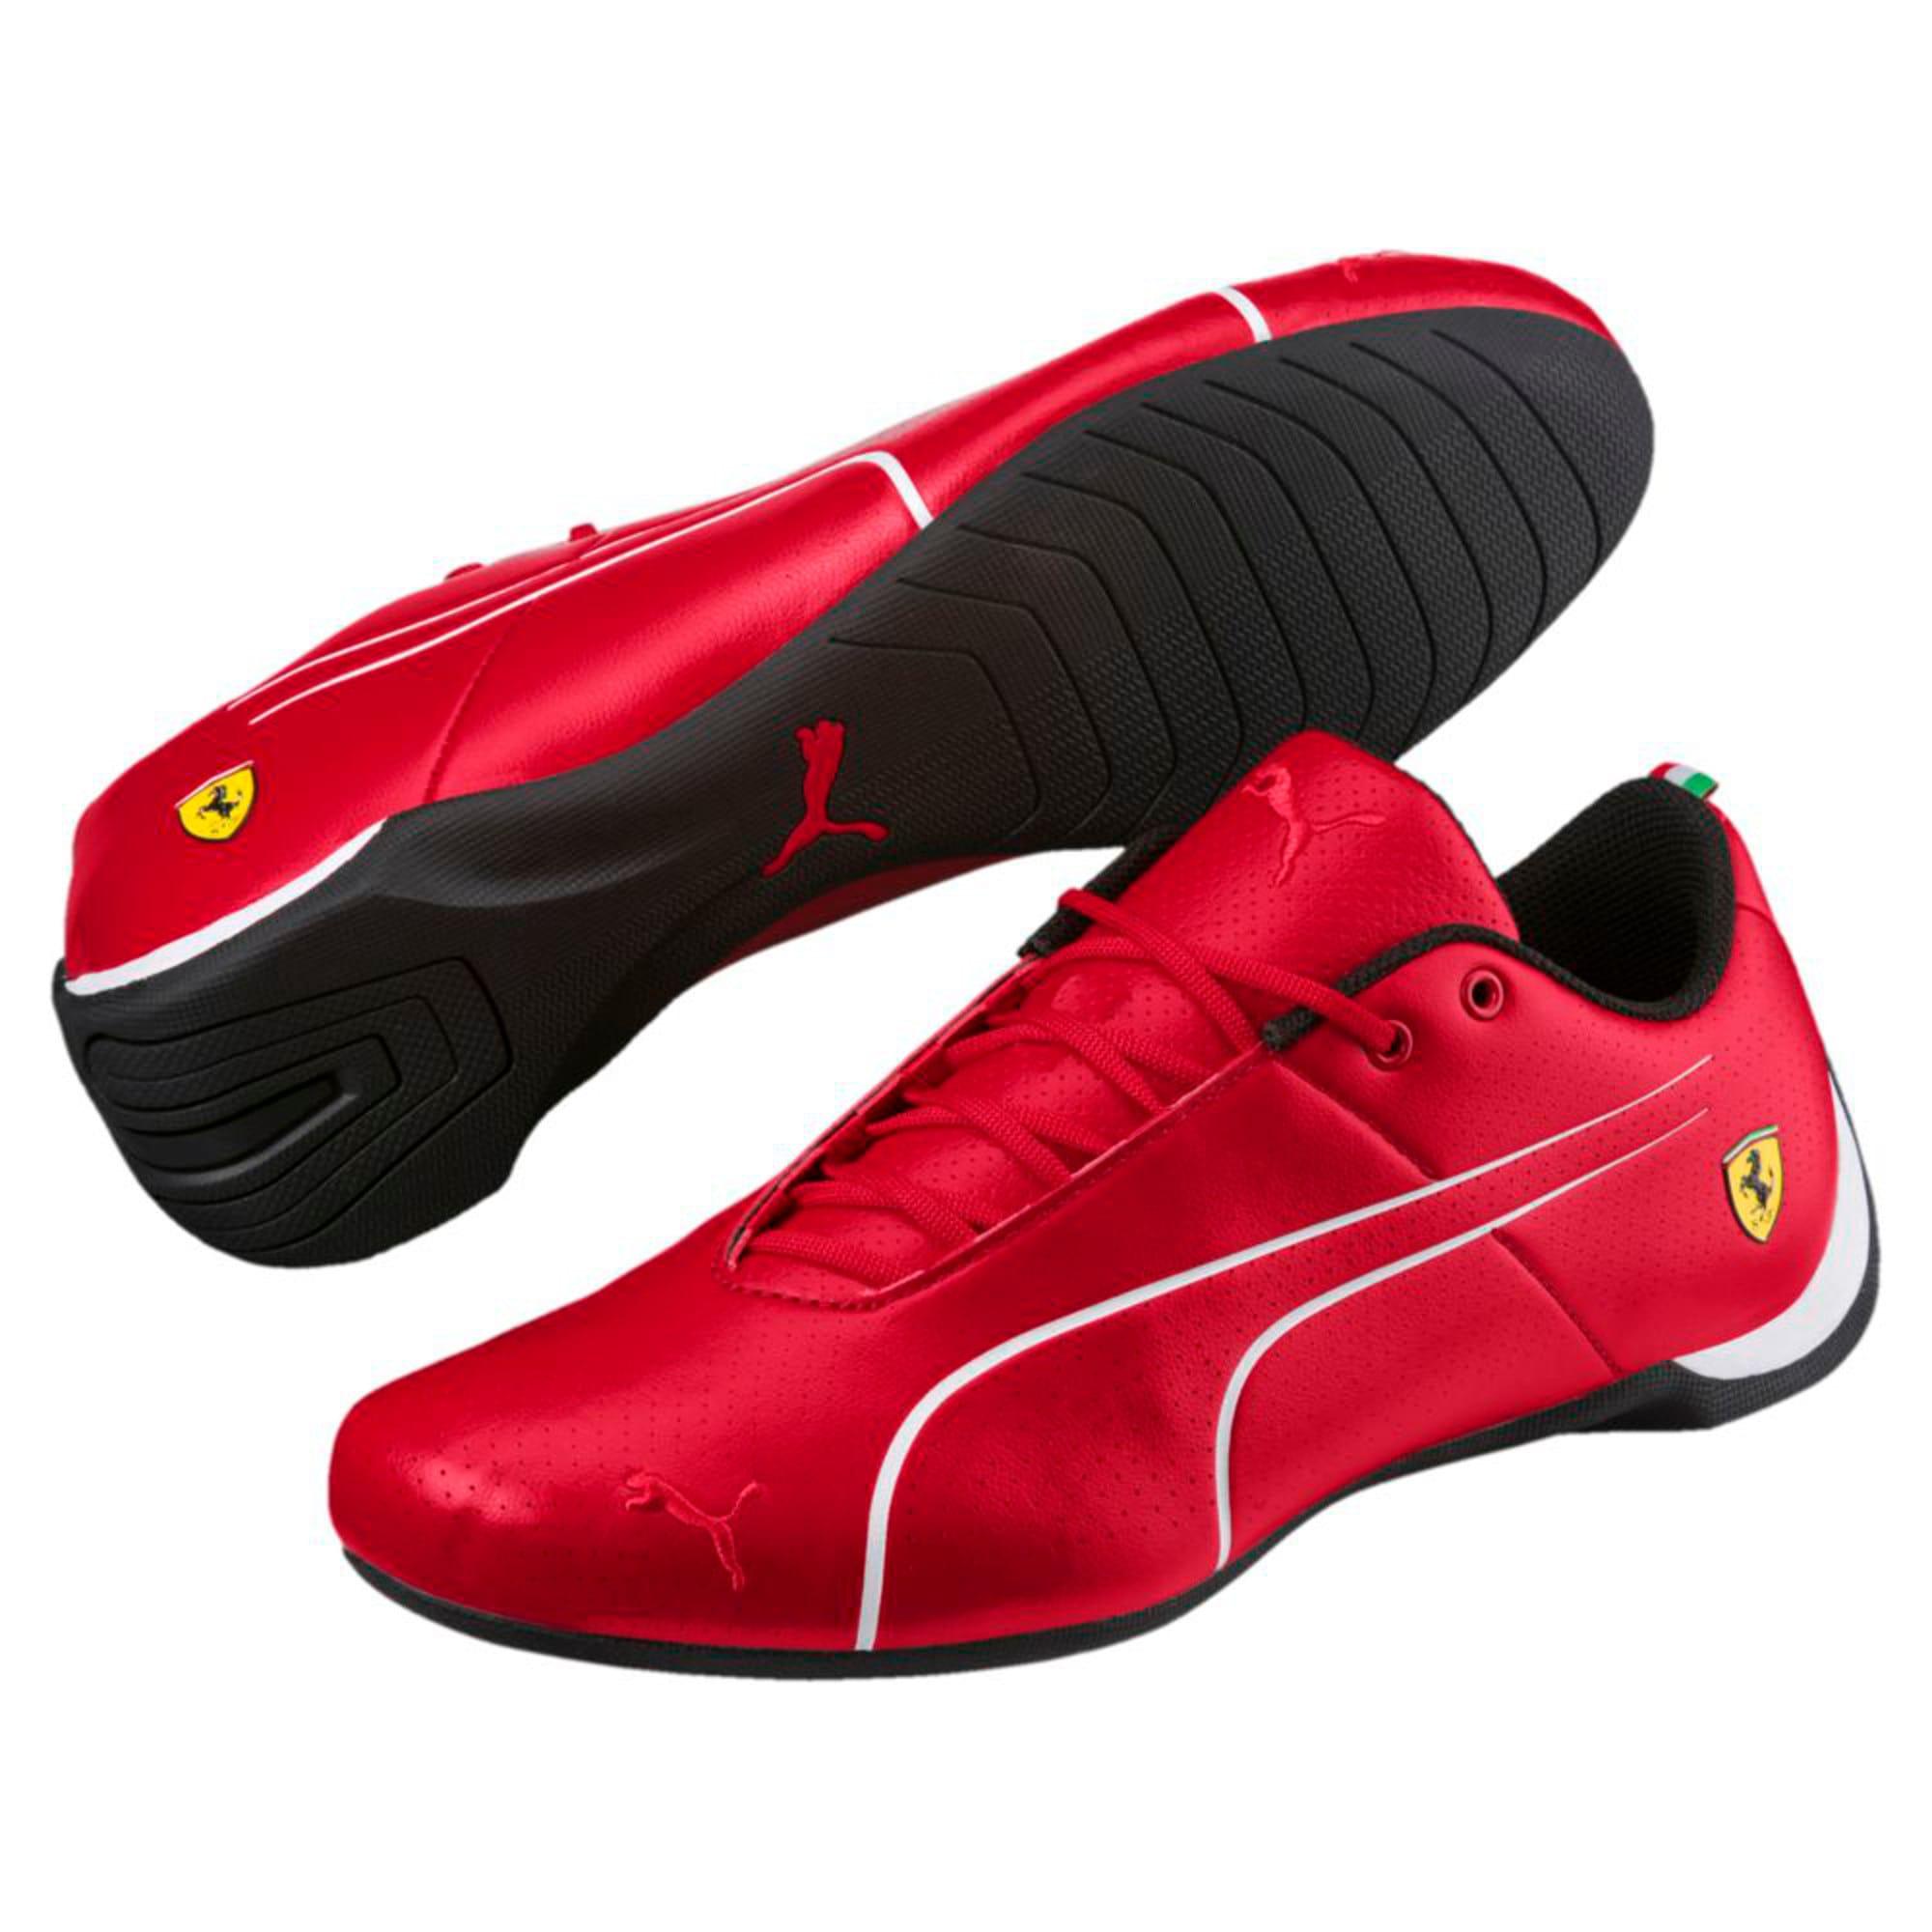 Thumbnail 2 of Ferrari Future Cat Ultra Trainers, Rosso Corsa-Puma White, medium-IND